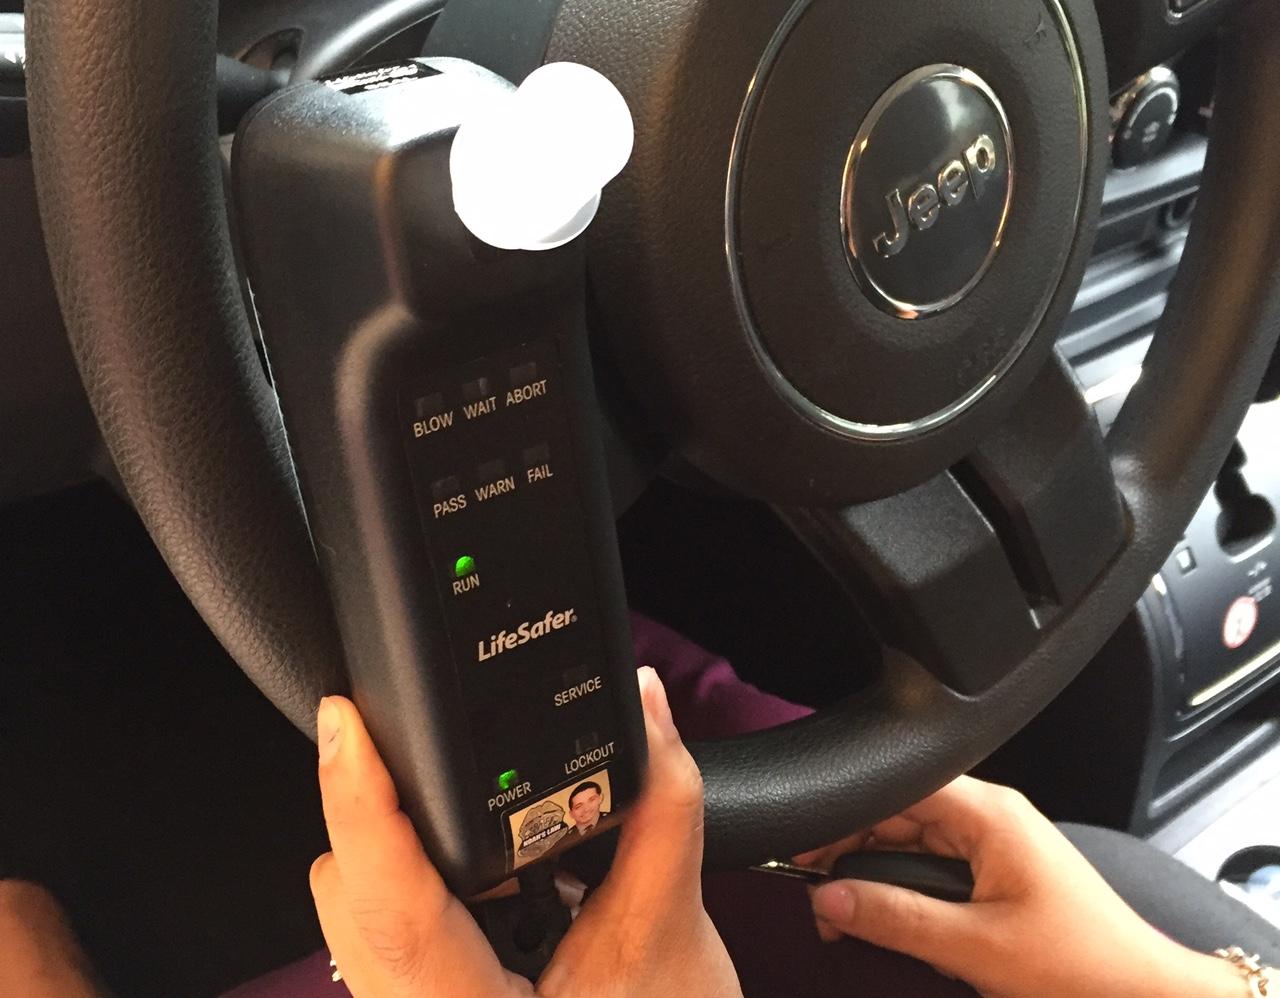 An example of an interlock device. (WTOP/John Aaron)